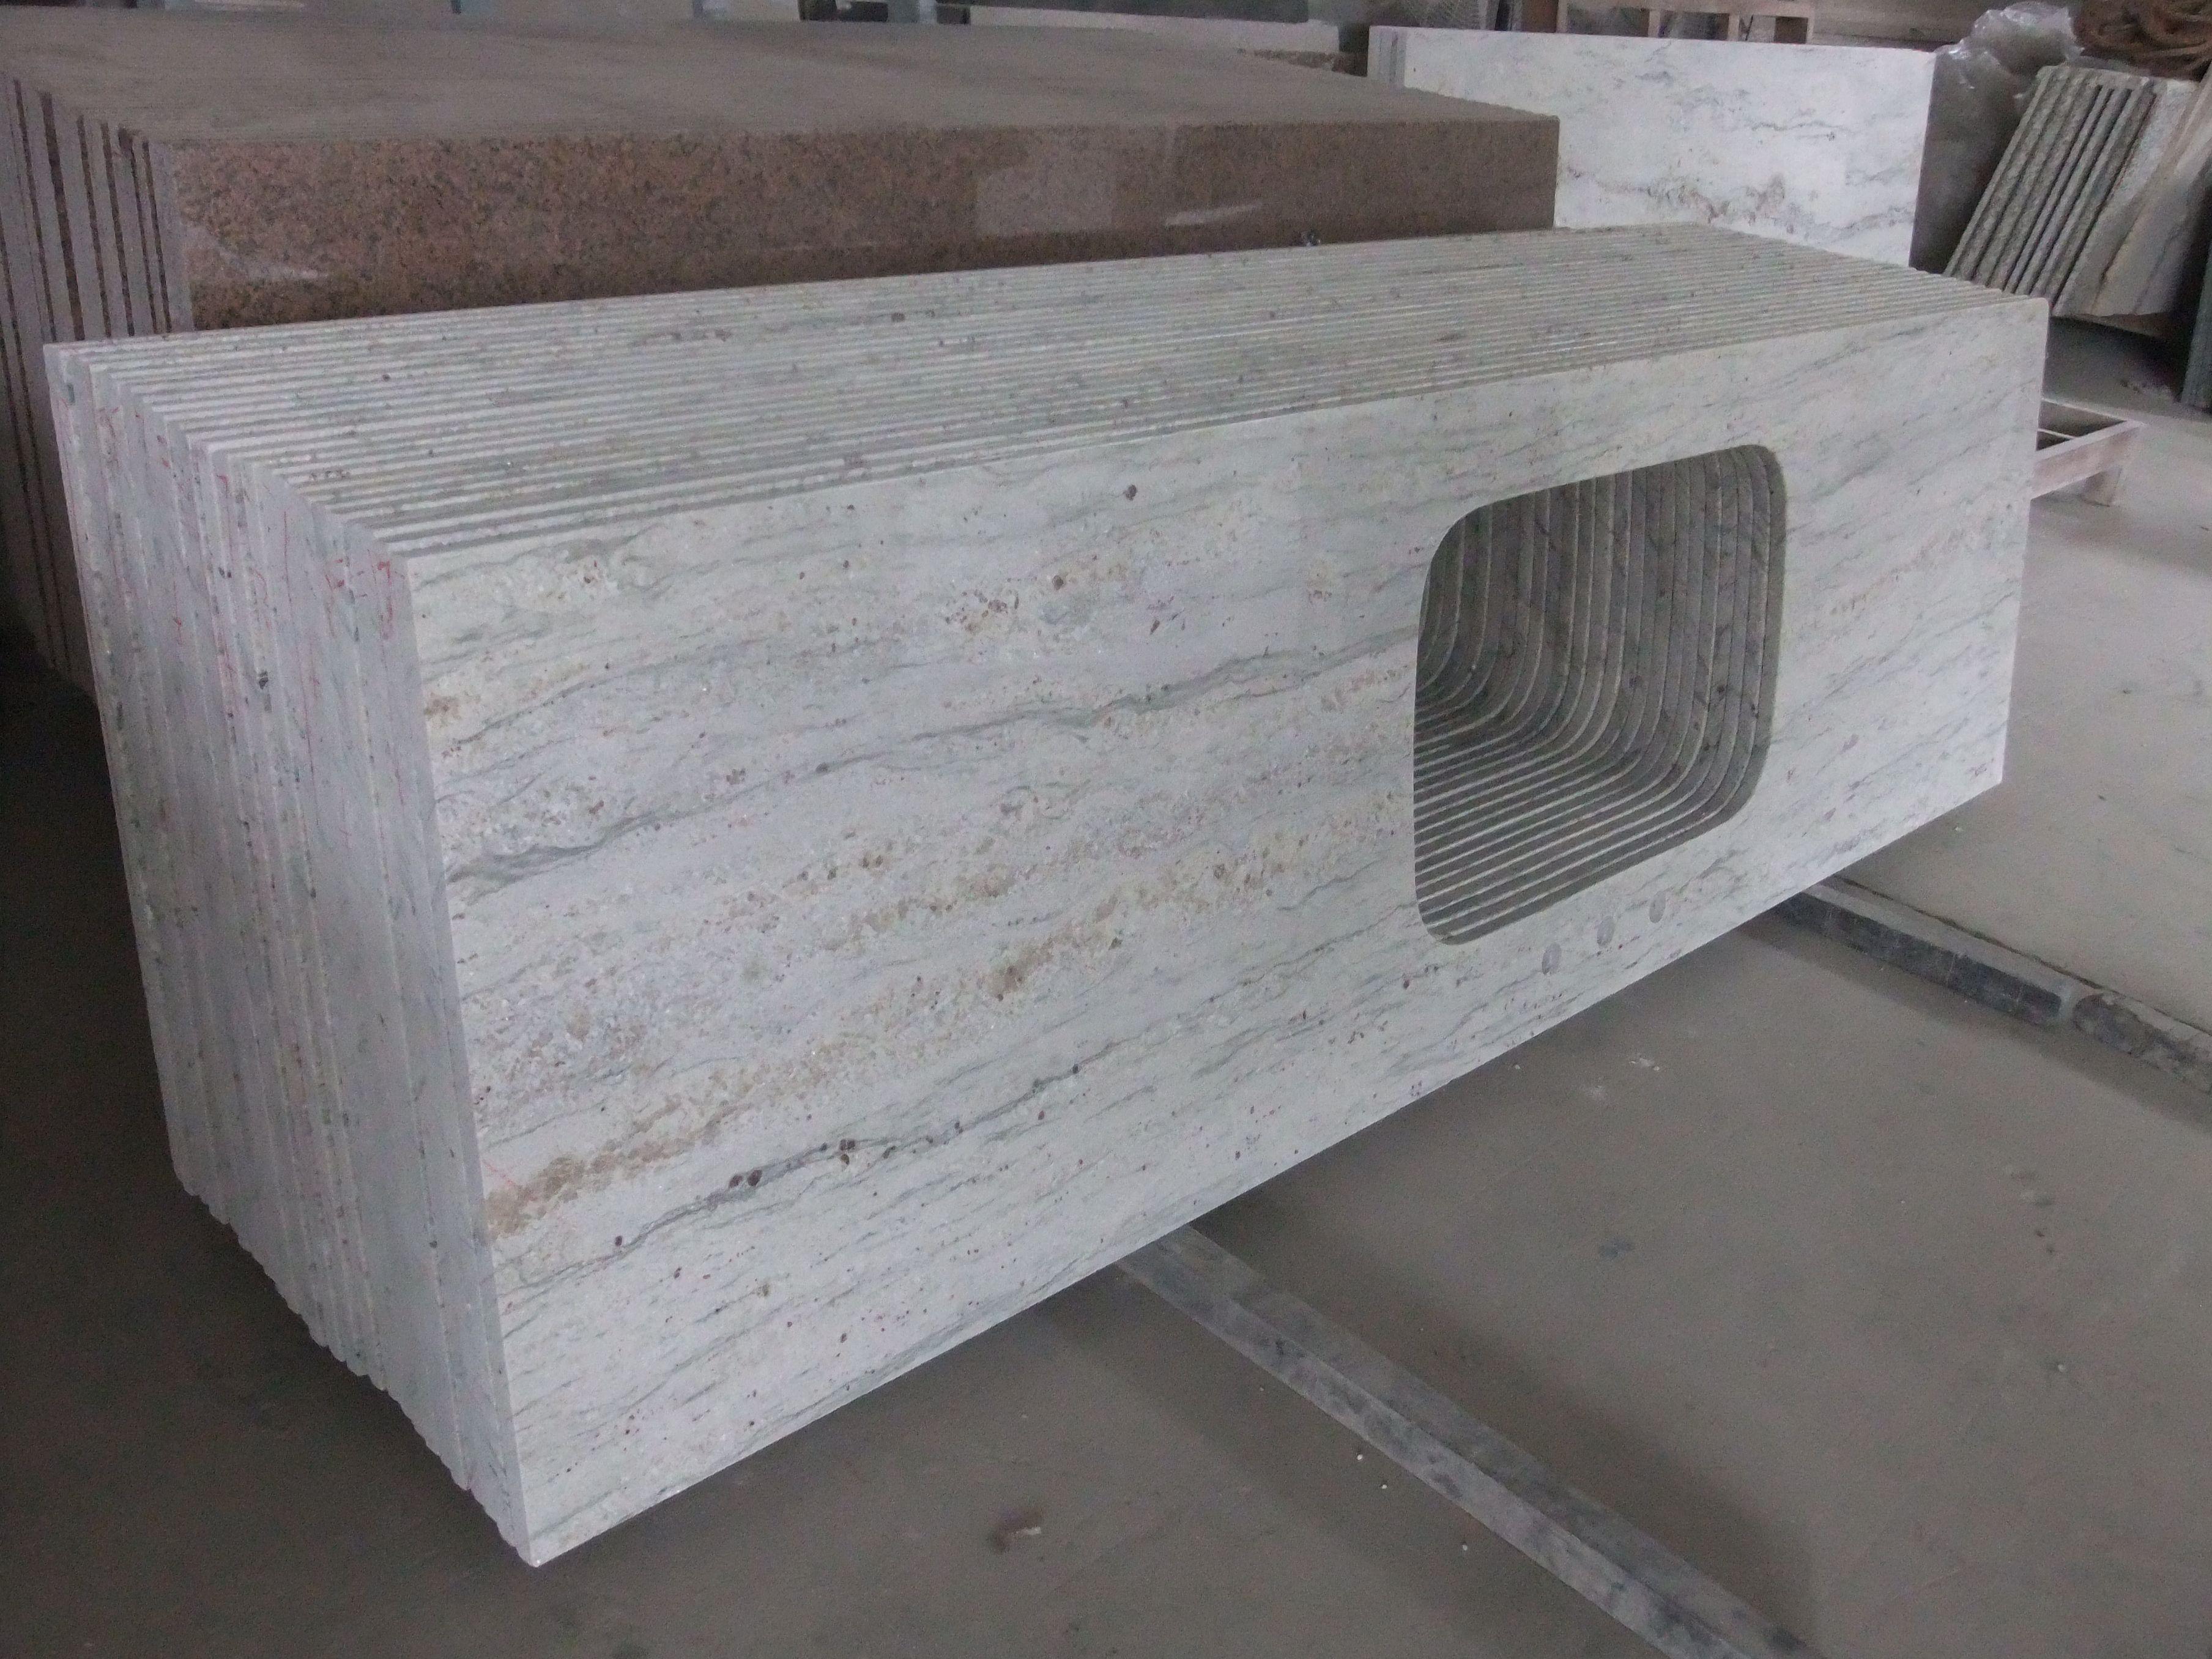 Charmant Newstar Supply NGJ102 River White Granite Granite Countertop China Factory  Xiamen Prefab Kitchen Granite Countertops